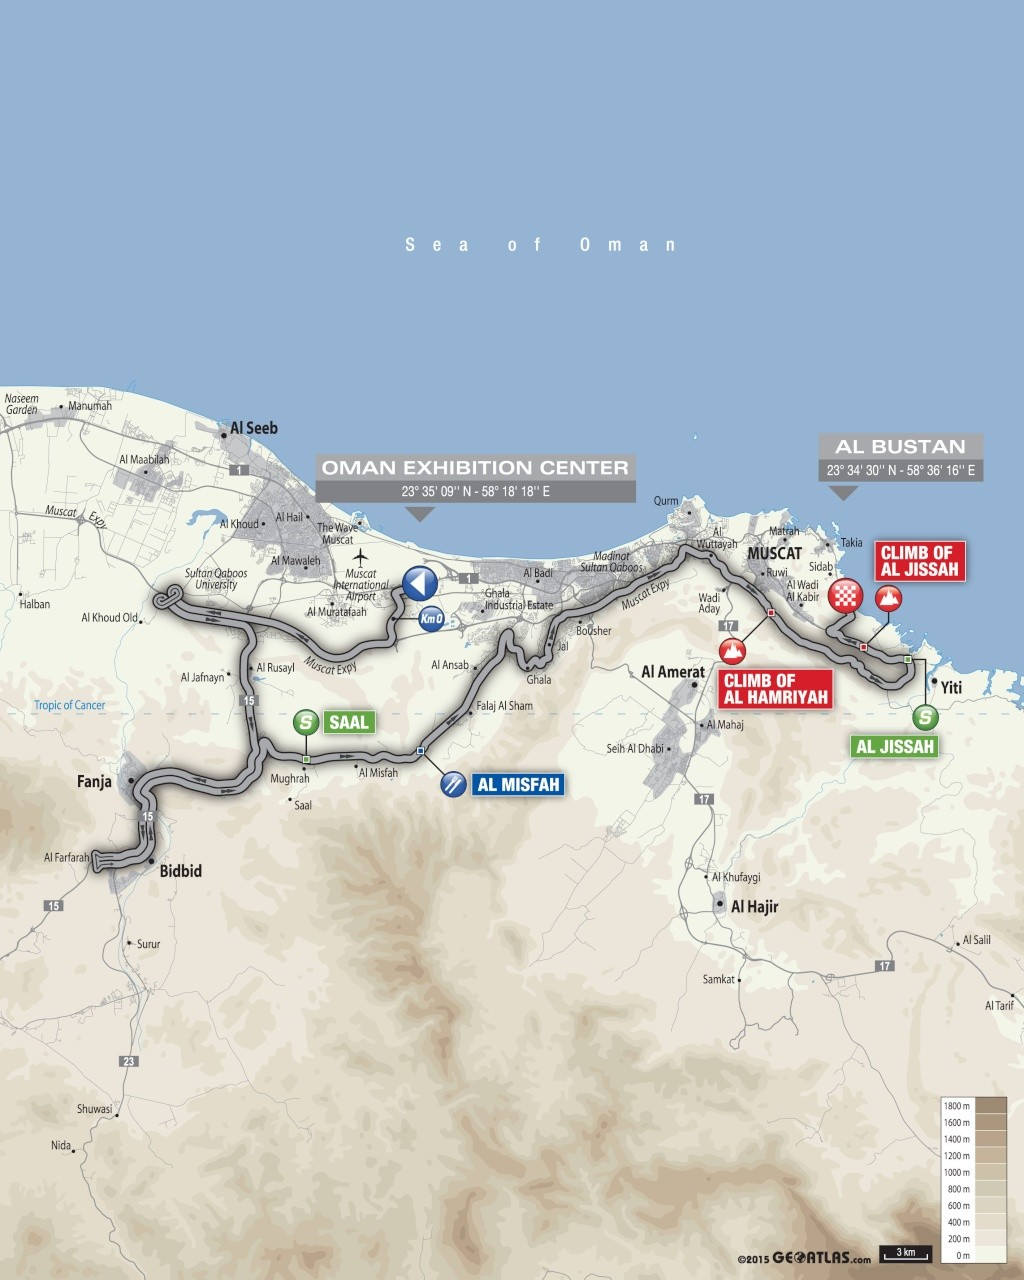 planimetria 2016 » 7th Tour of Oman (2.HC) - 1a tappa » Oman Exhibition Center › Al Bustan (145.5 km)